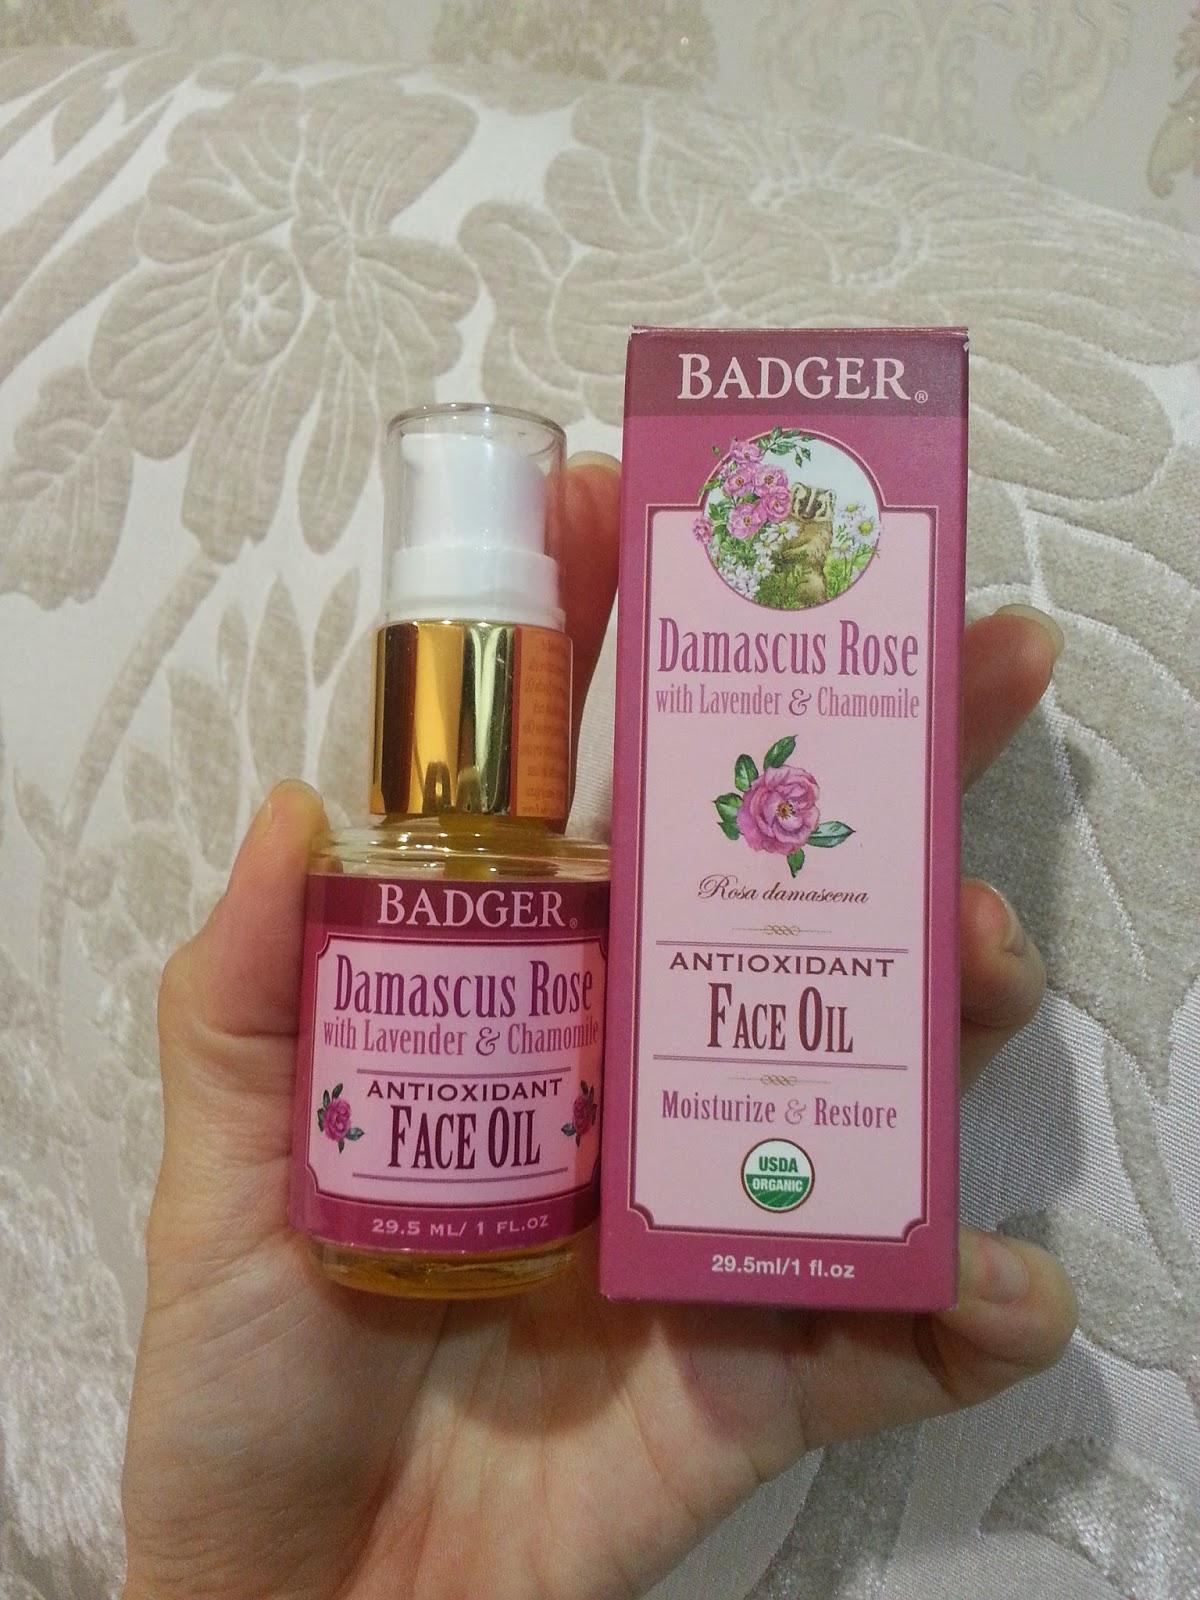 Badger damascus rose